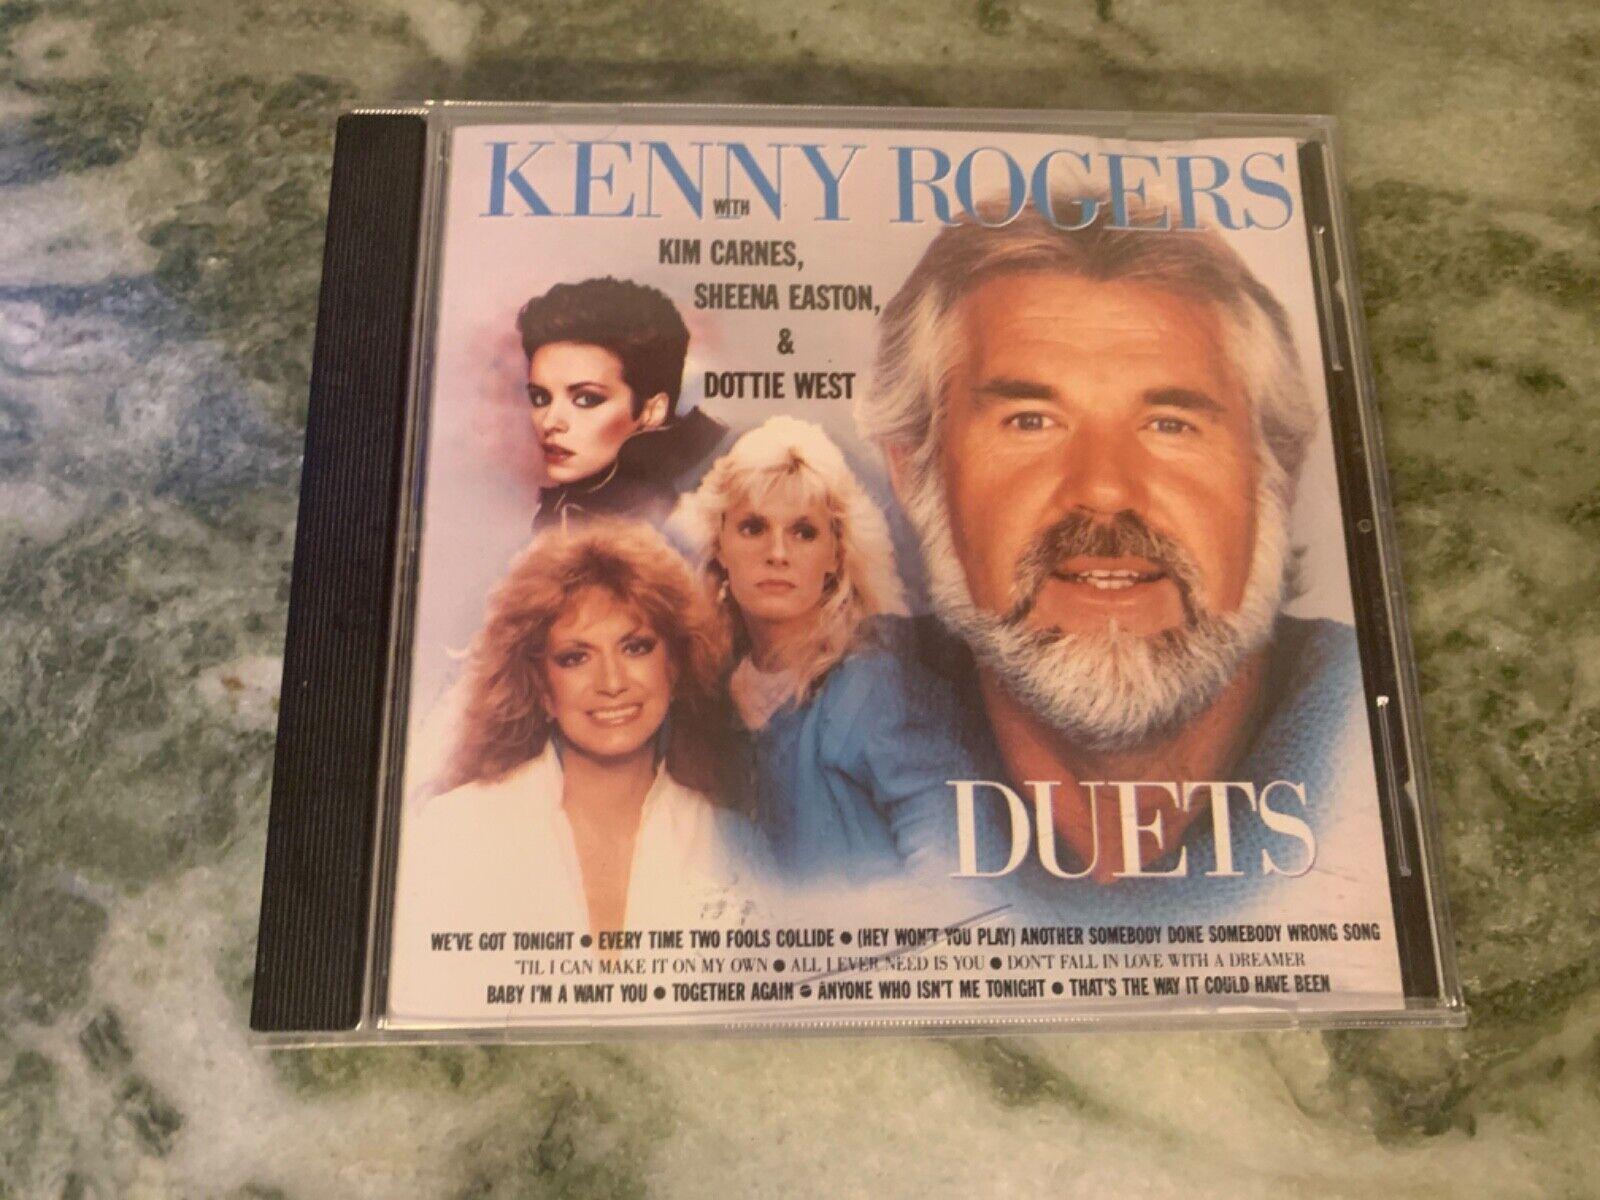 Kenny Rogers Duets Oop Cd Kim Carnes Dottie West Sheena Easton Made In Usa For Sale Online